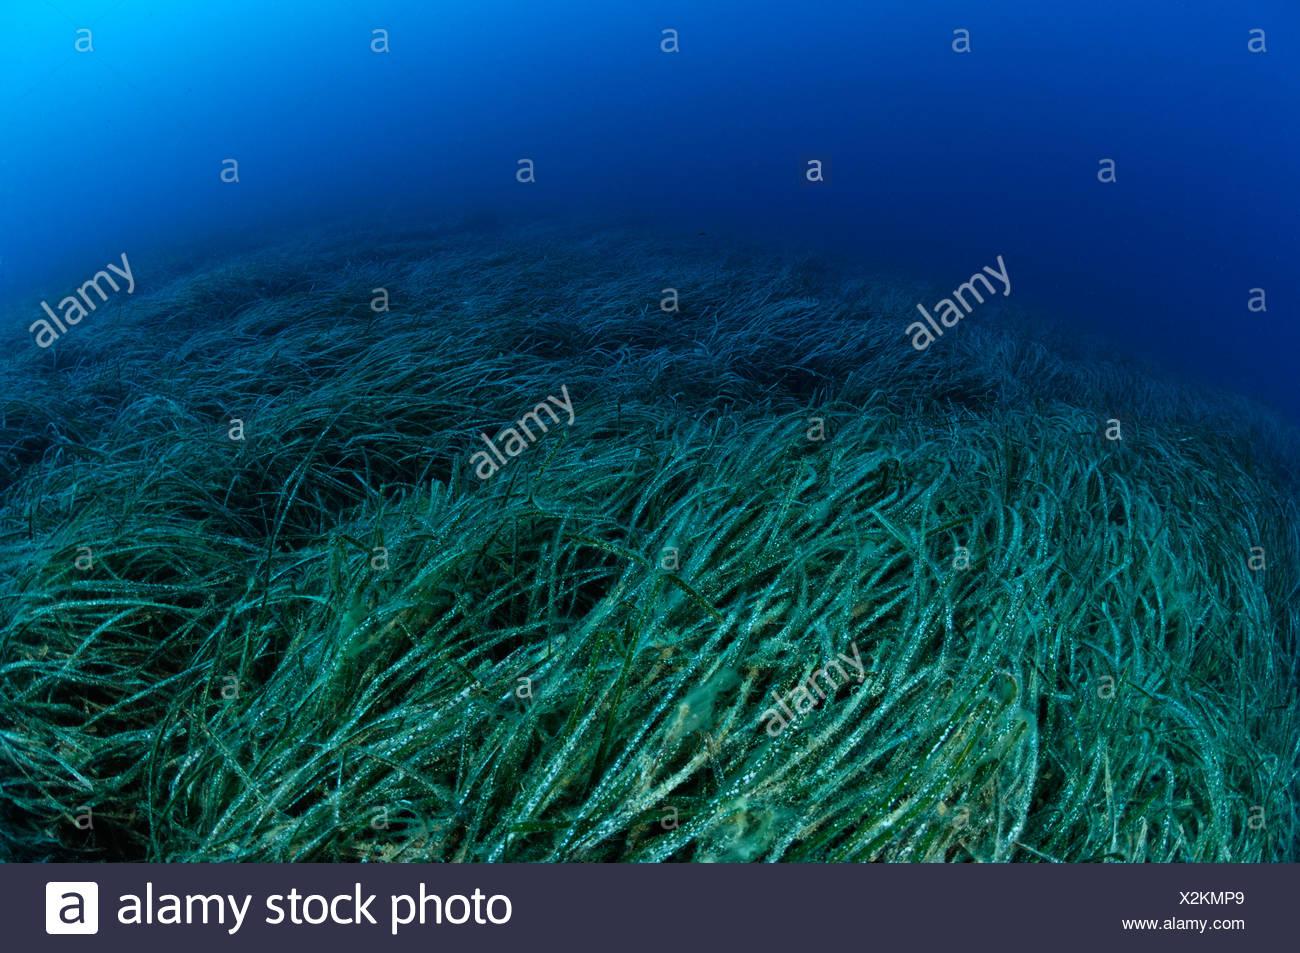 Seagrass Meadow Posidonia oceanica Susac Island Adriatic Sea Croatia - Stock Image